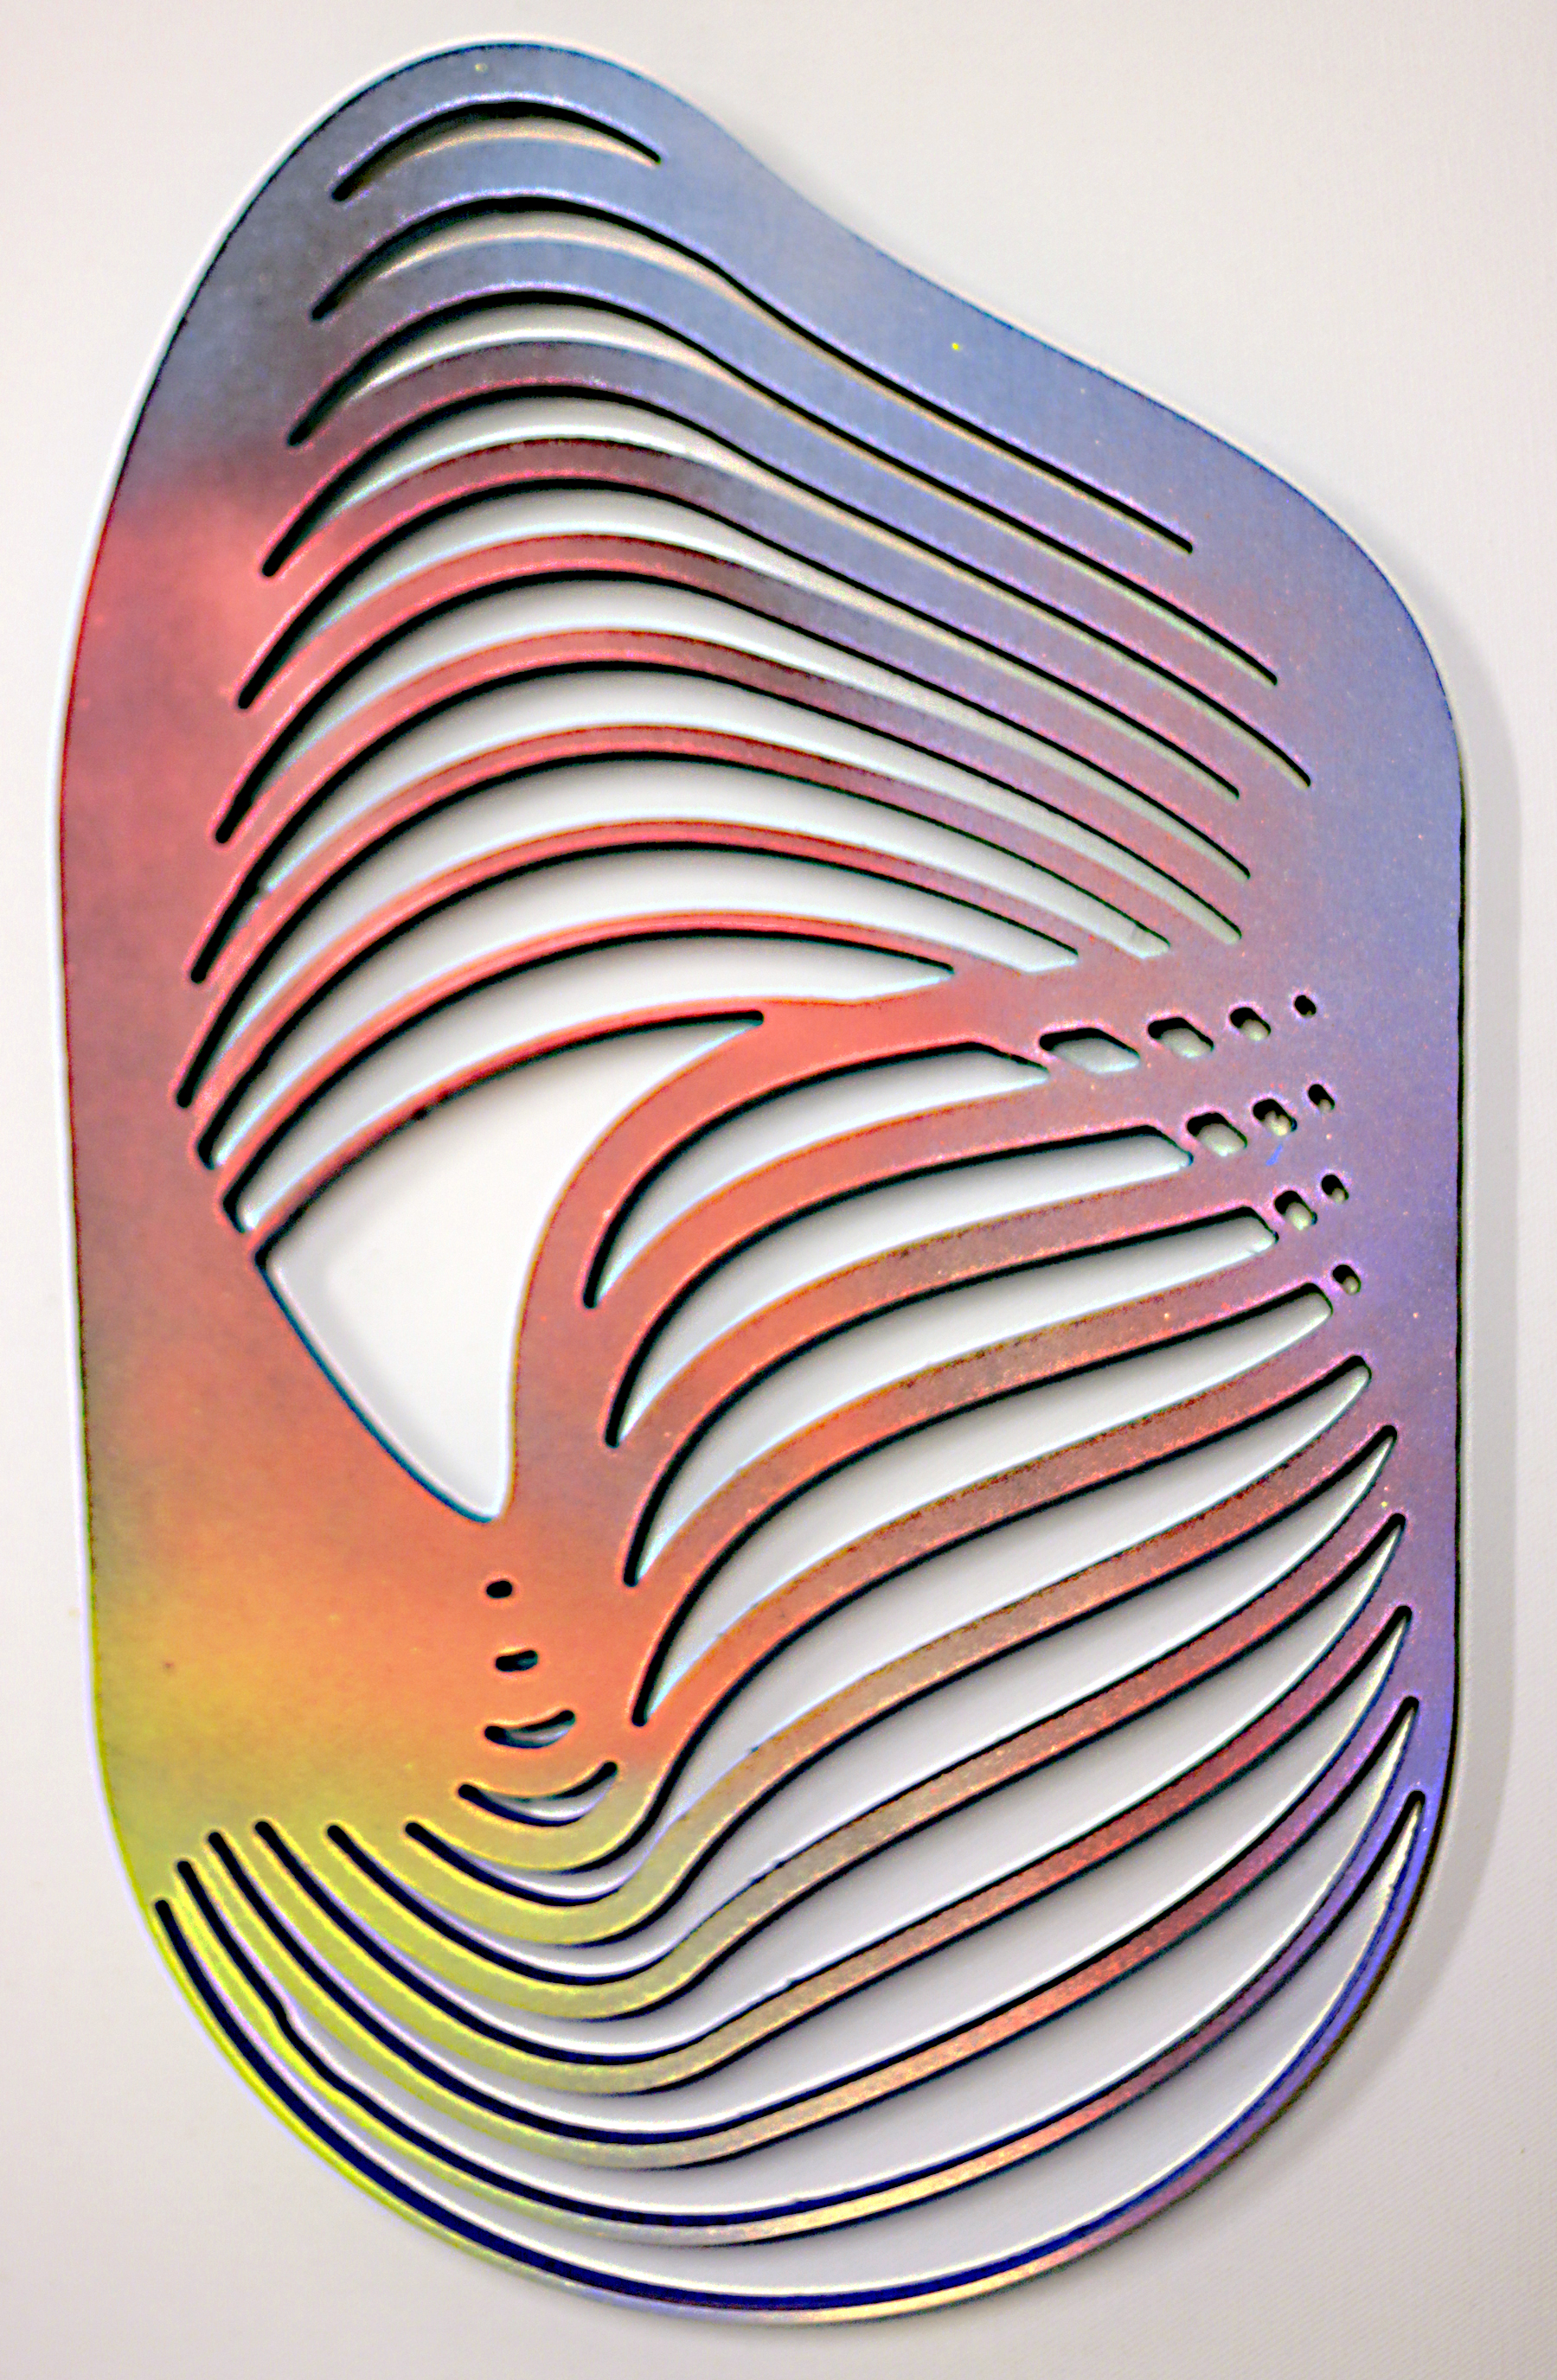 Mick_ALANWILSON_17x10.3_4_Wood_Spray paint_Original_2018_550.jpg